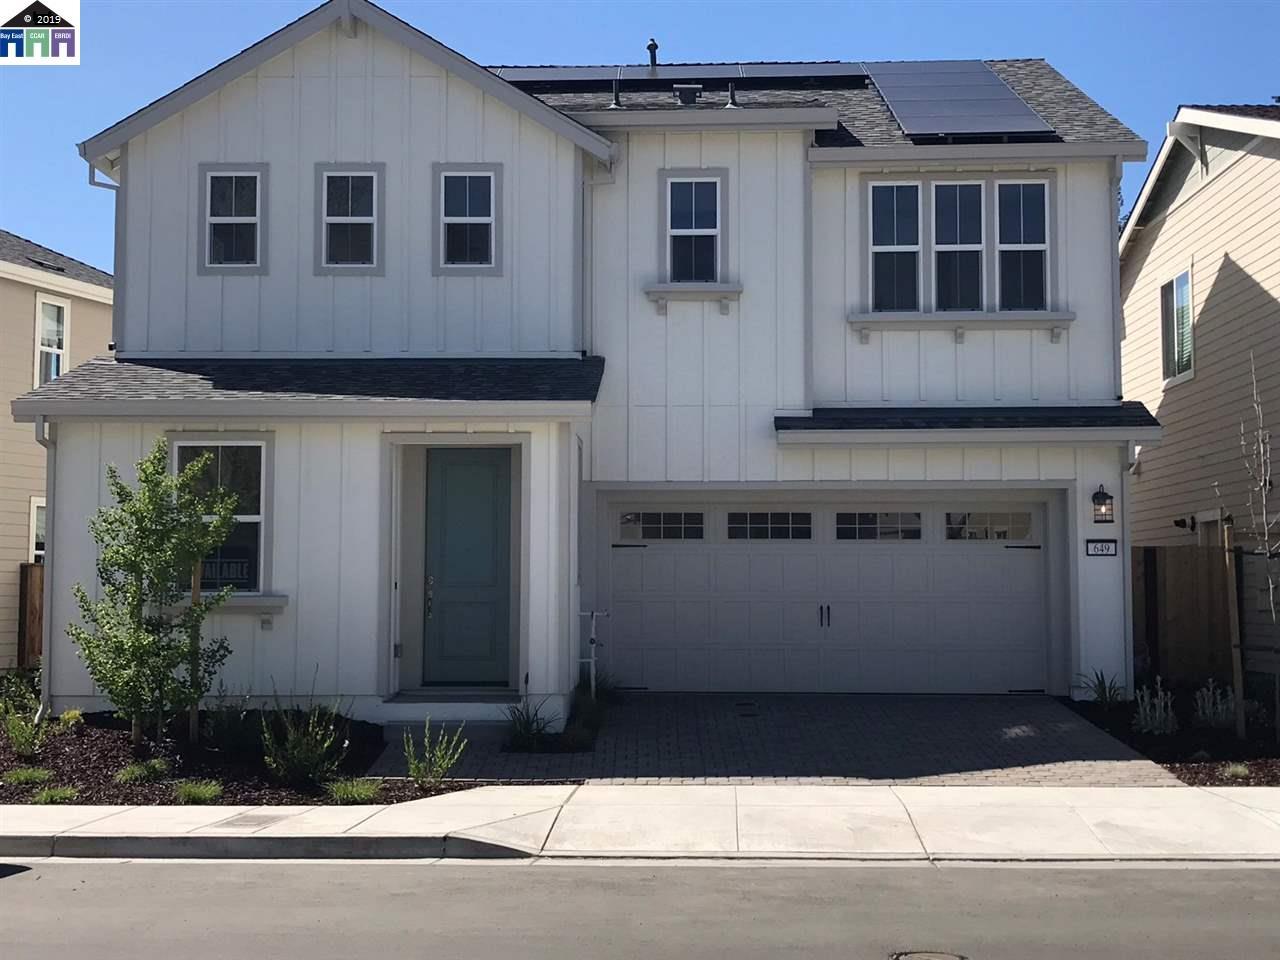 649 Olympic Hayward, CA 94544